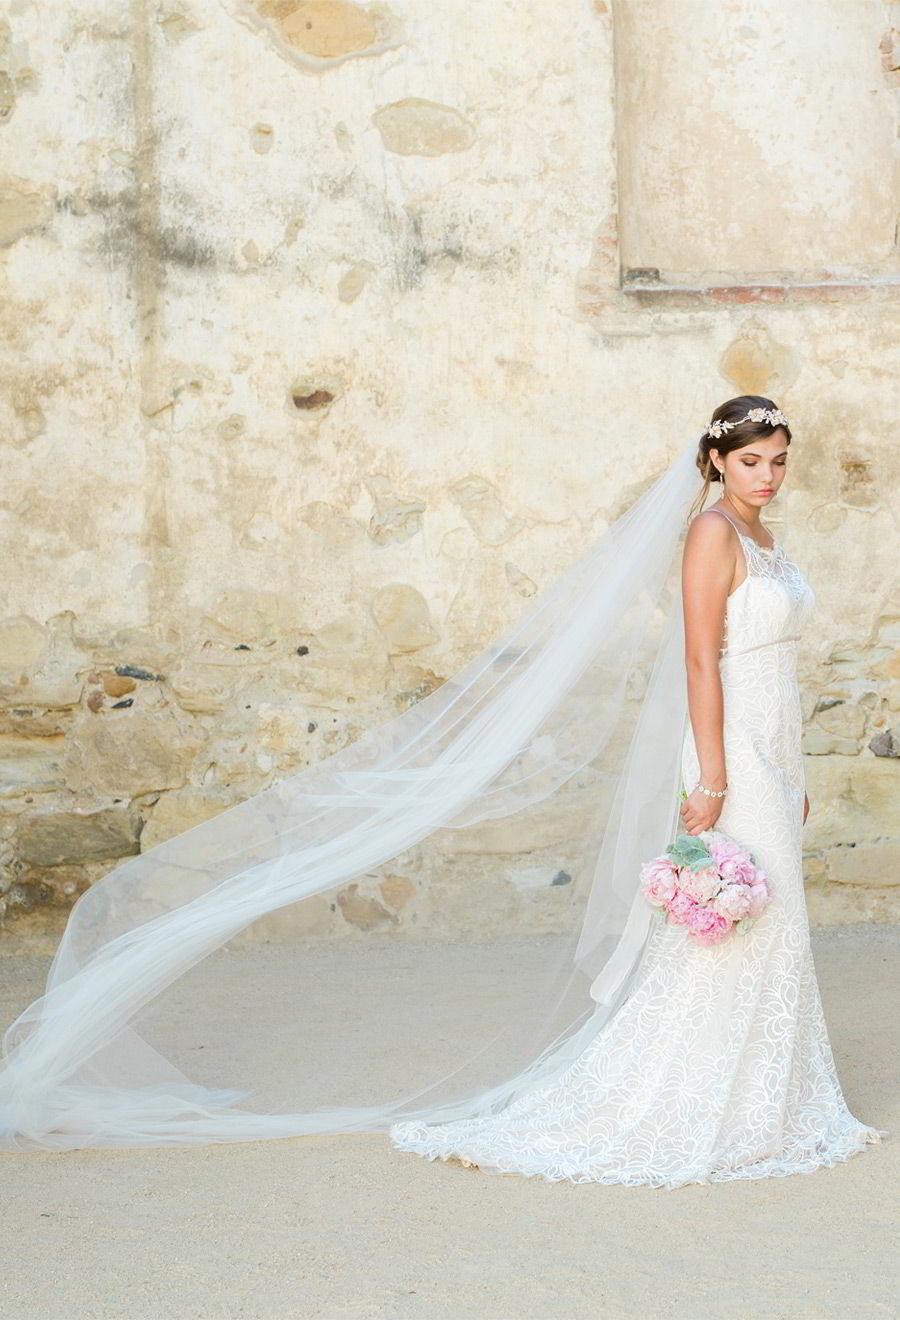 bel aire bridal accessories 6778 soft fabric flowers rhinestone pearl headpiece V7333C cathedral veil wedding dress train